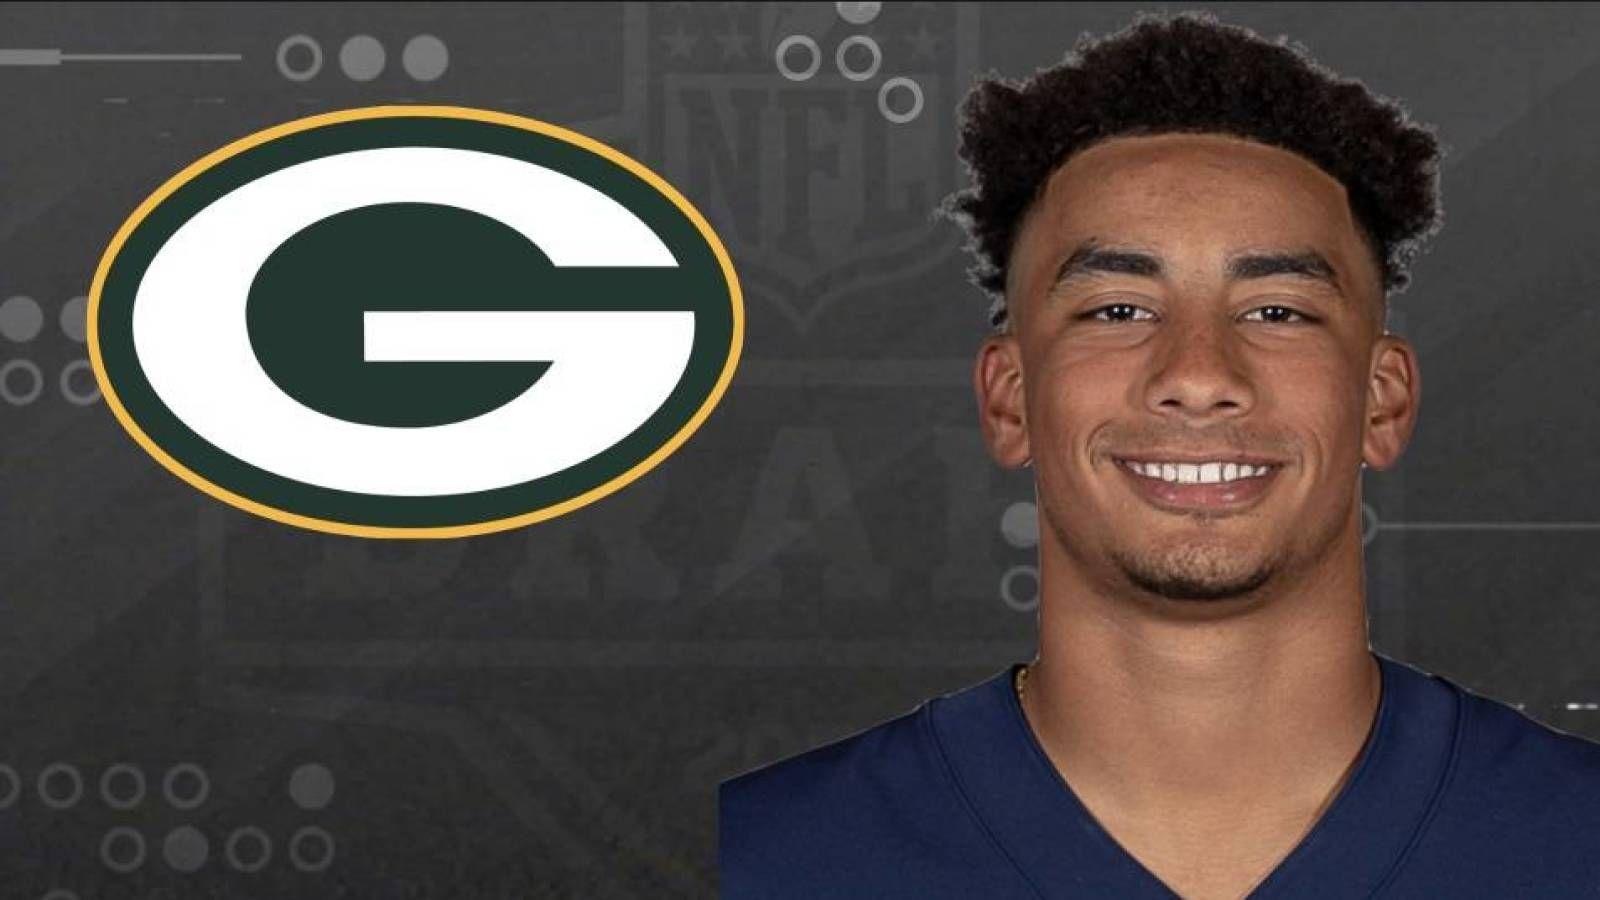 Pin By Iris On Futbol Americano In 2020 Packers Nfl Network Nfl Draft